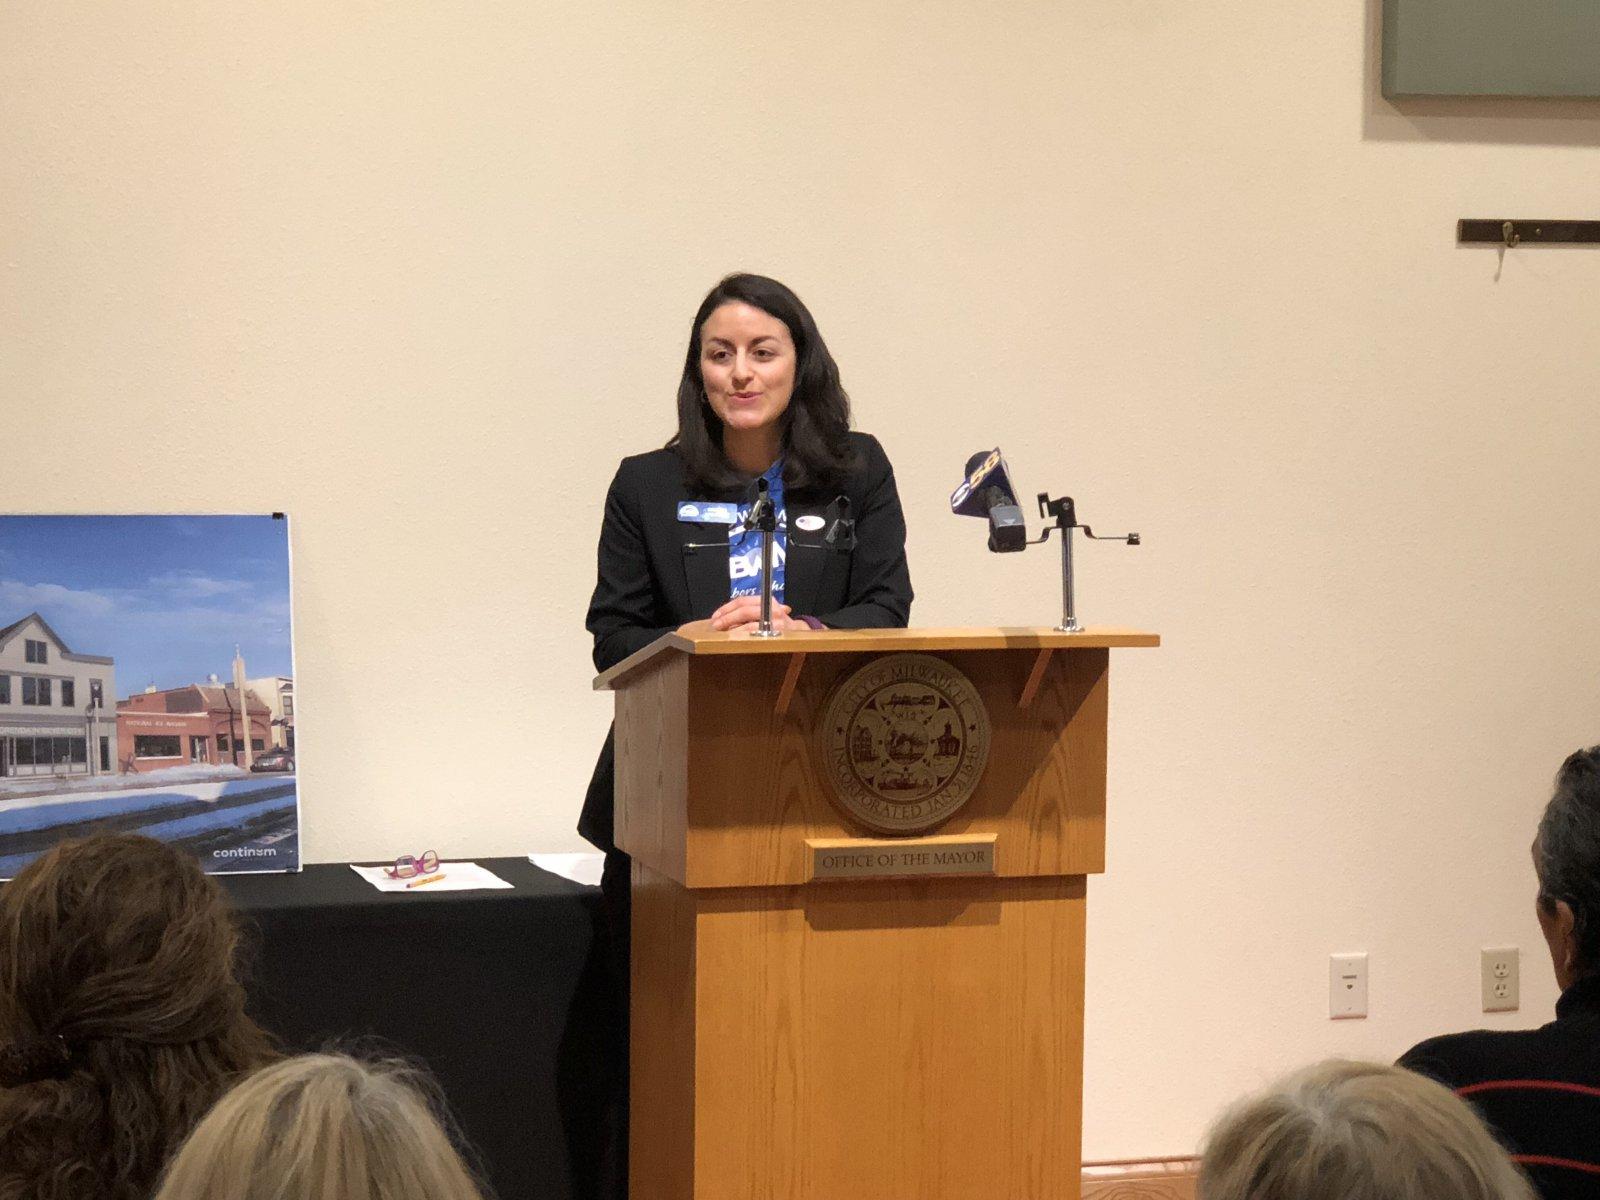 Brianna Sas-Pérez speaking at the groundbreaking of 3514 W. National Ave. Photo taken February 20th, 2018 by Jeramey Jannene.